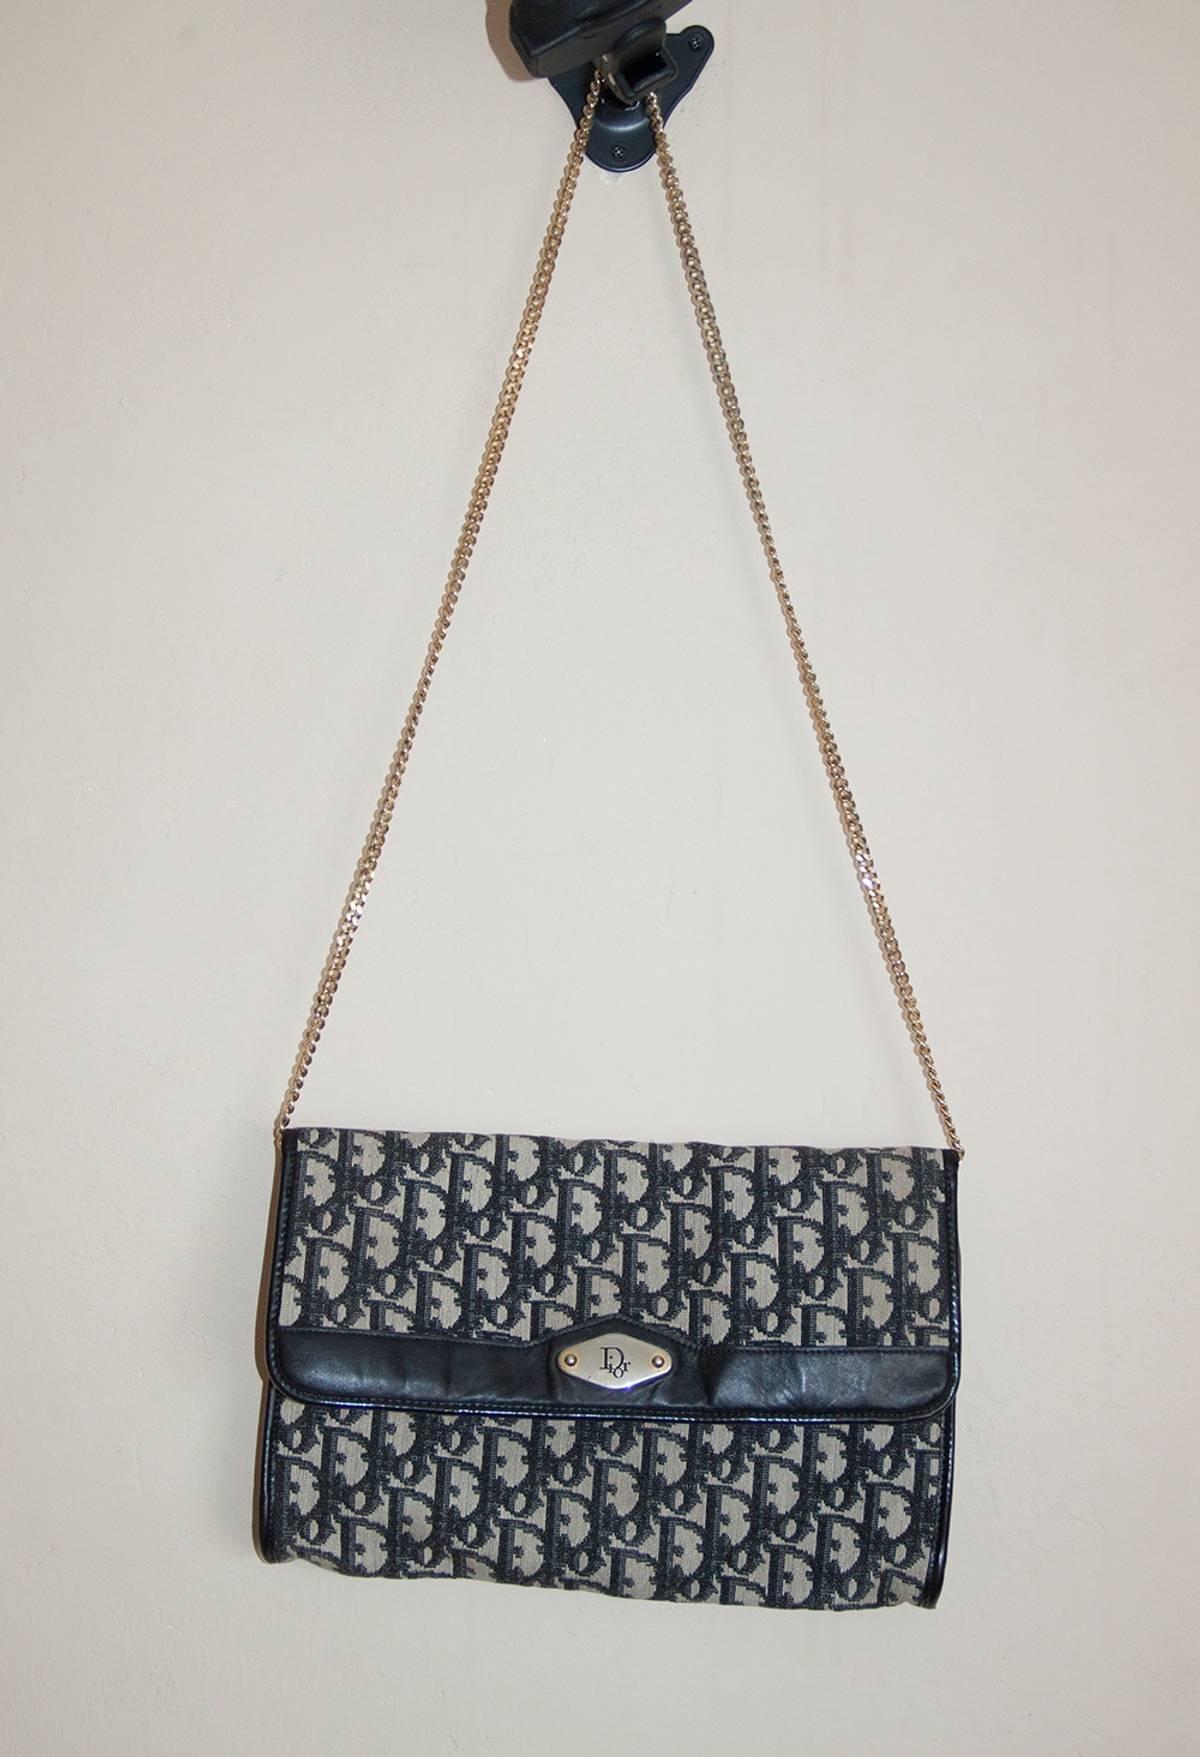 21fc138033926d Dior 80's Dior Vintage Monogram Muff Bag Made In France | Grailed